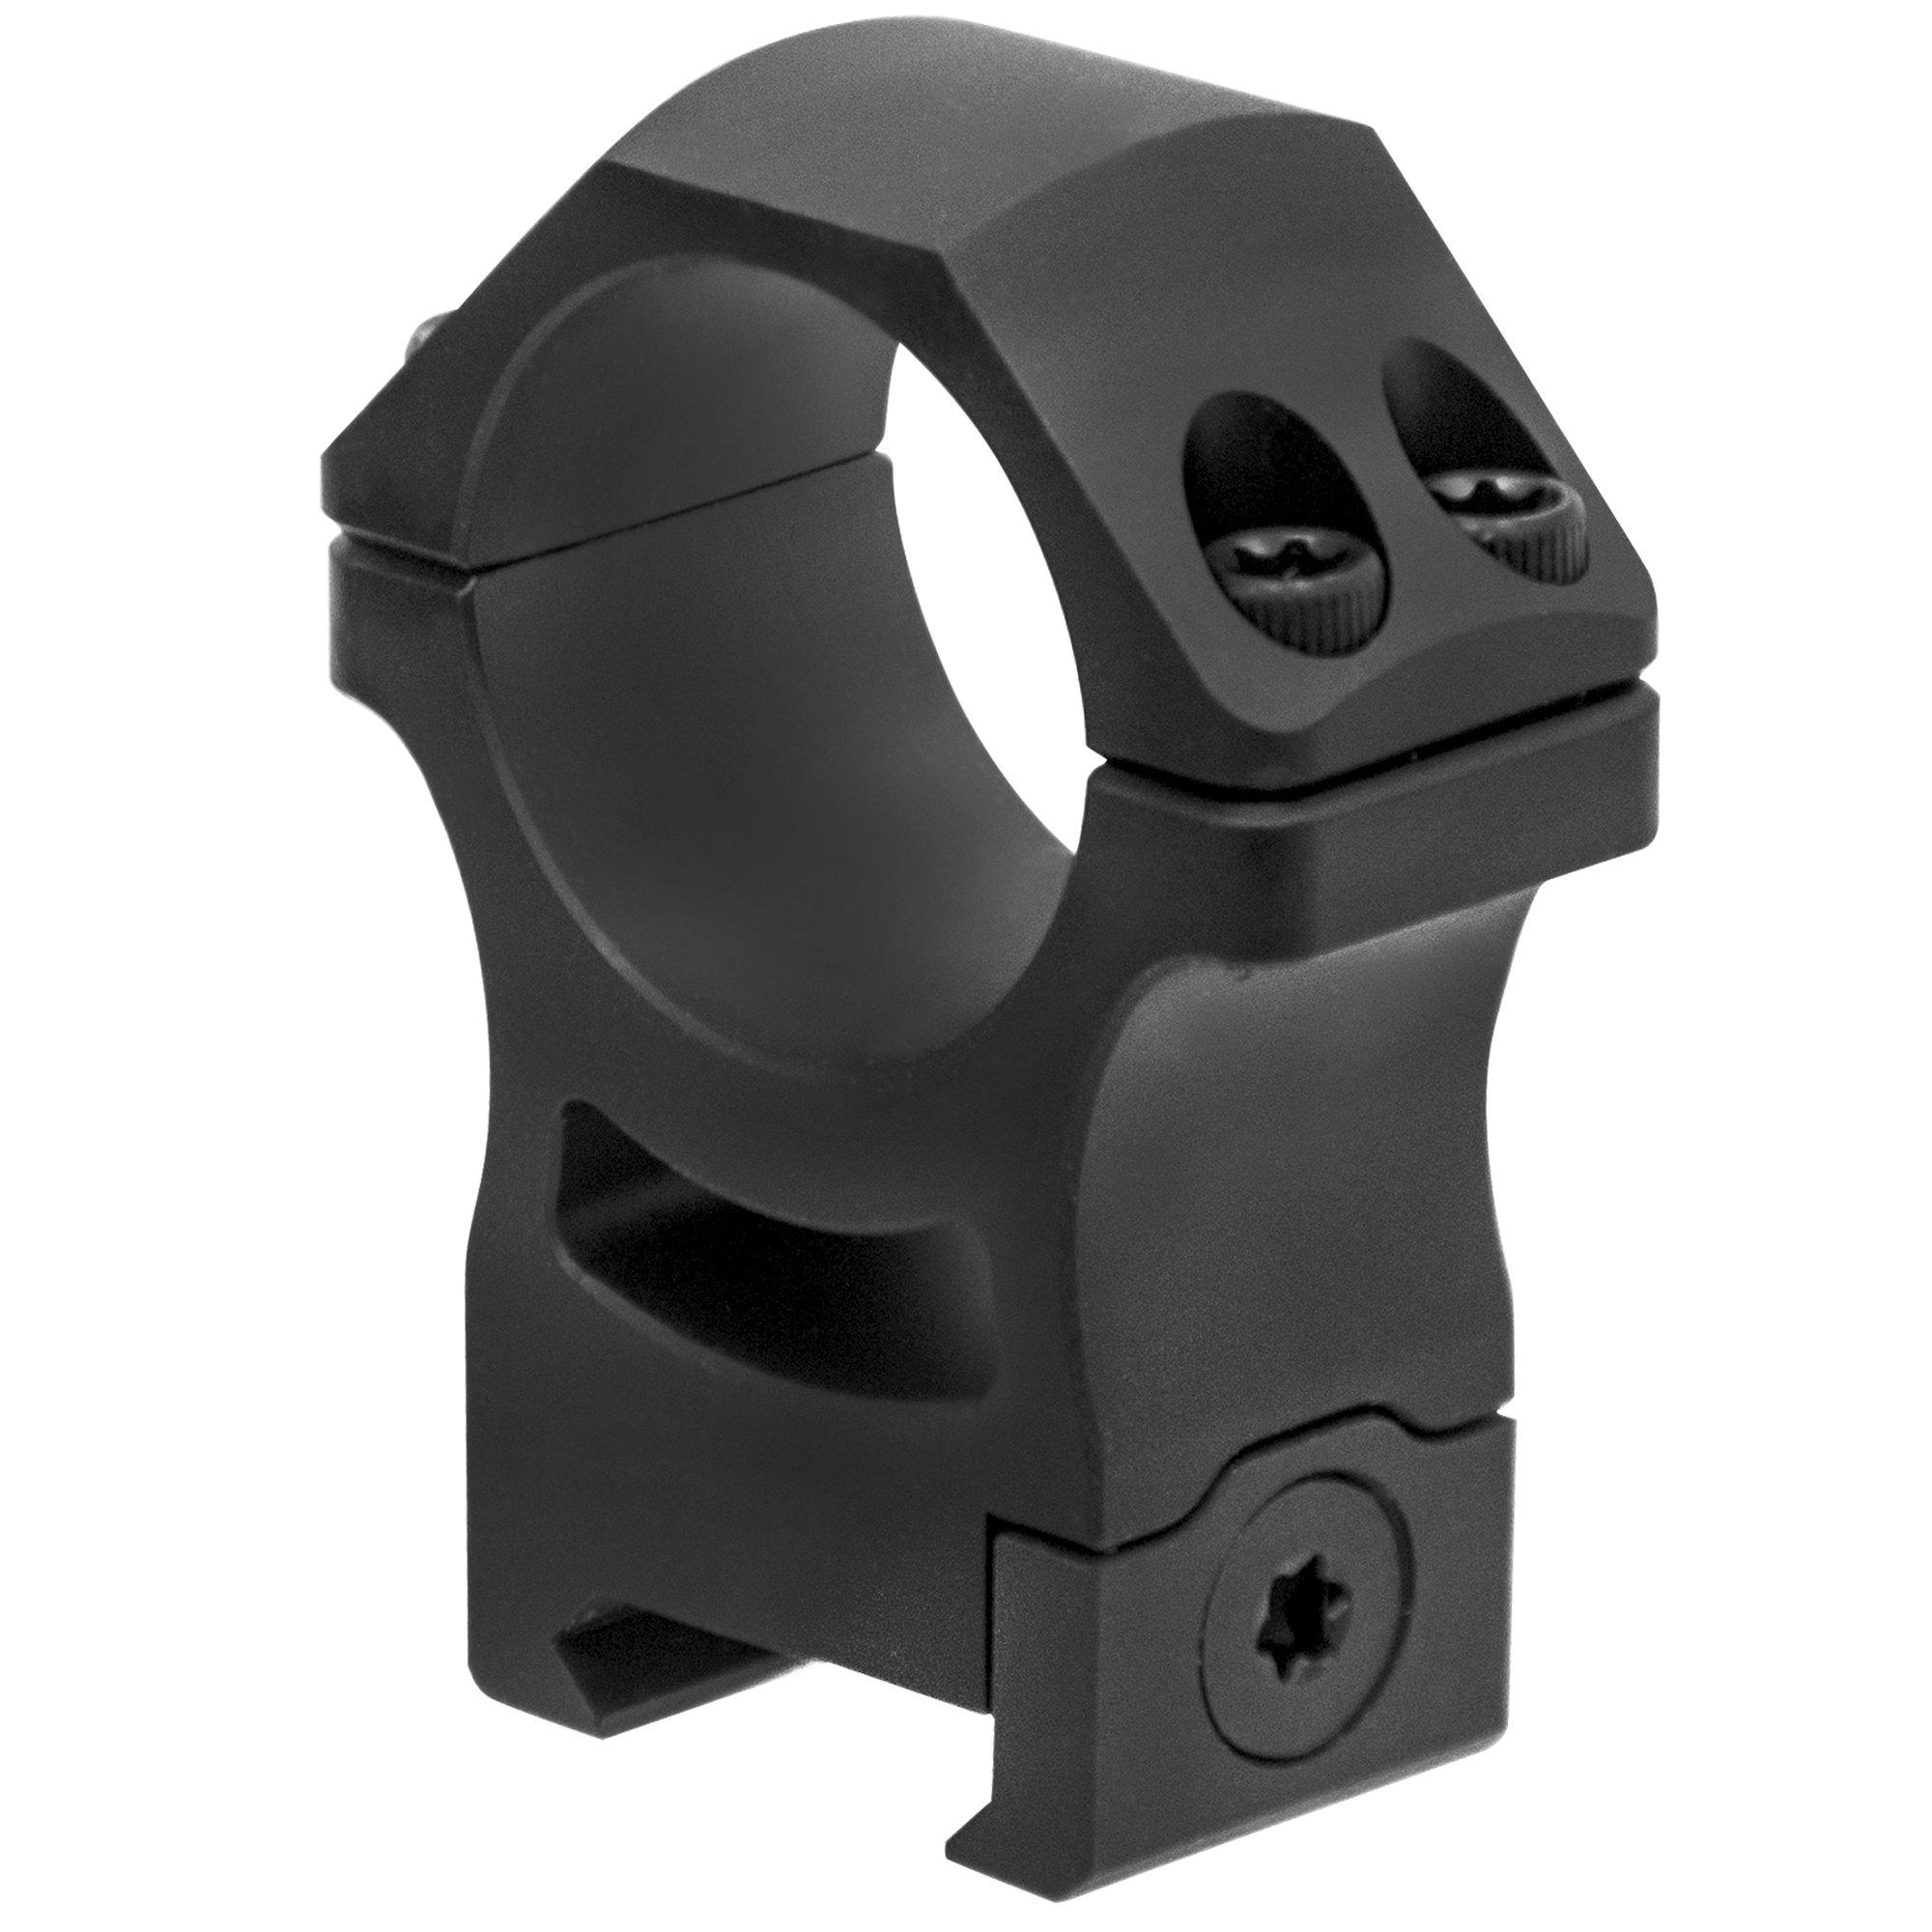 UTG PRO US Made 30mm/2PCs High Profile POI Picatinny Rings by UTG Pro